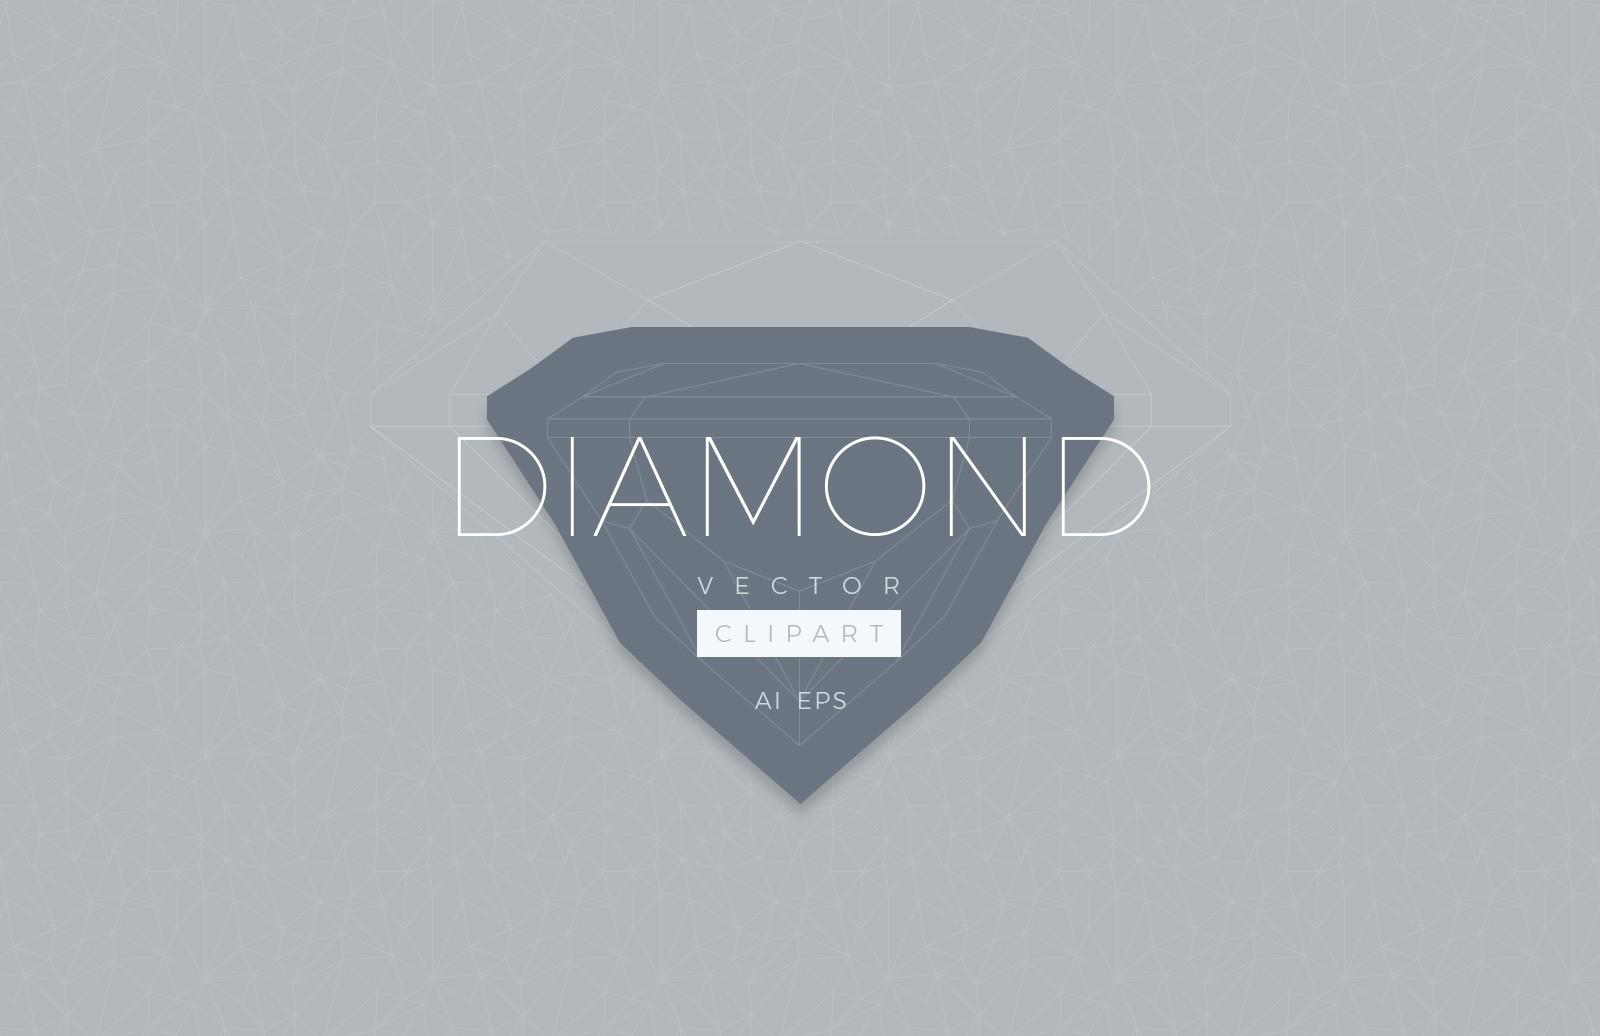 Diamond Vector Clipart.